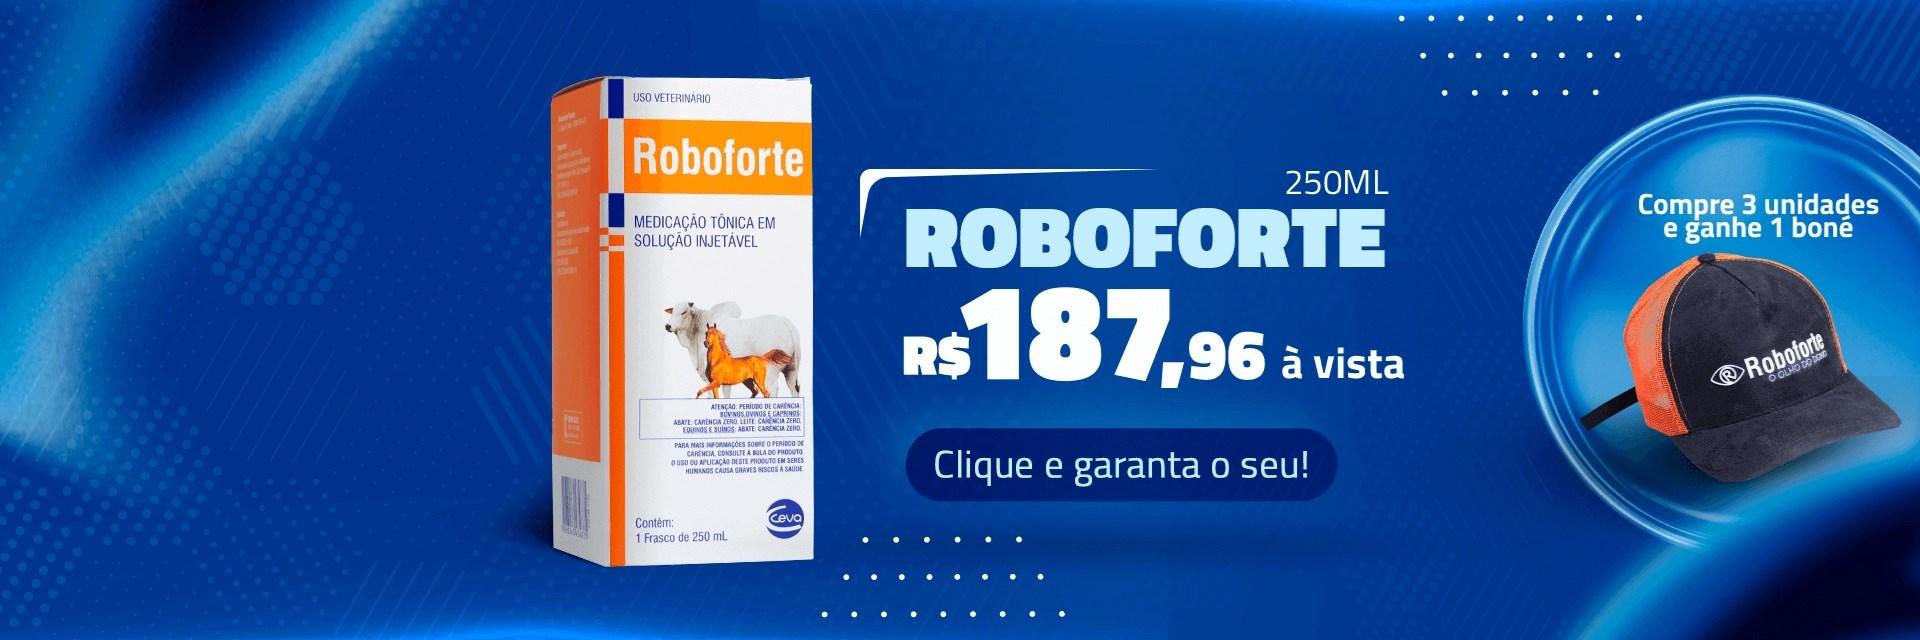 Roboforte